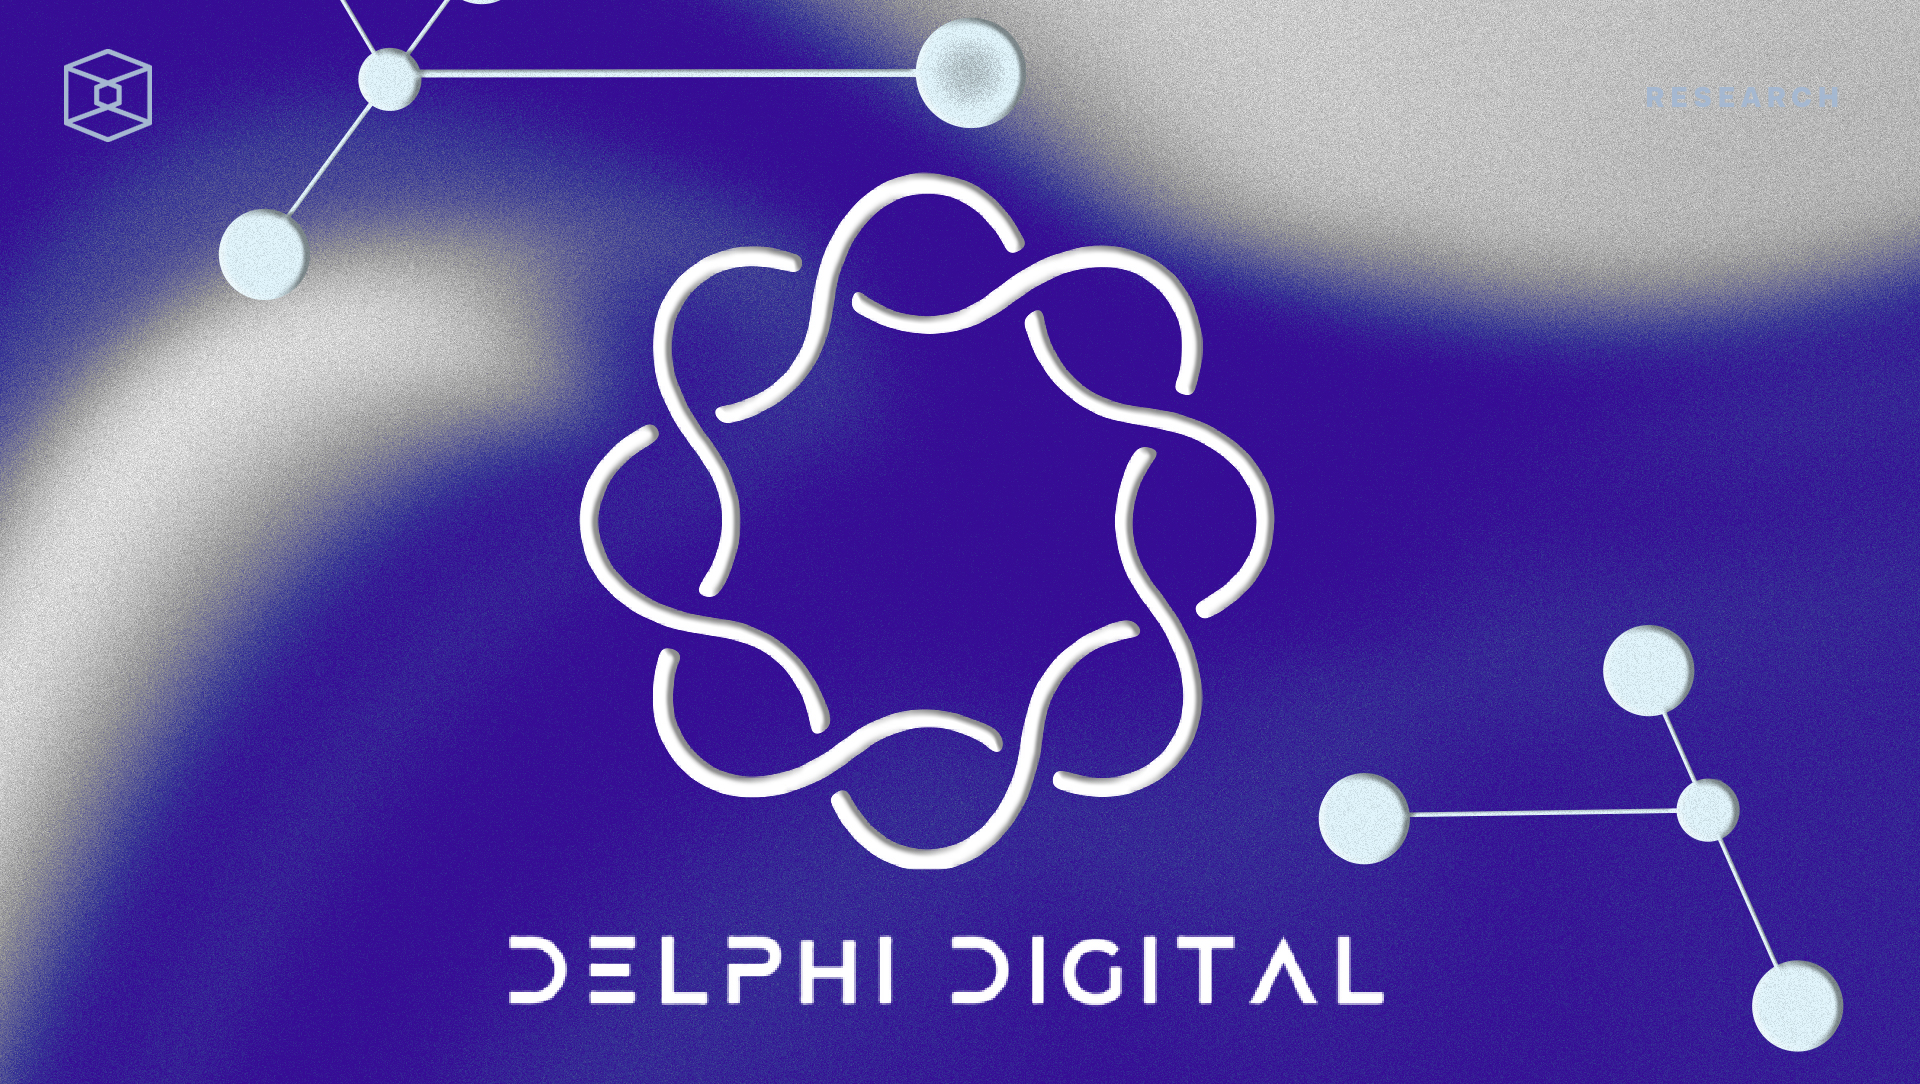 Mapping out Delphi Digital's portfolio